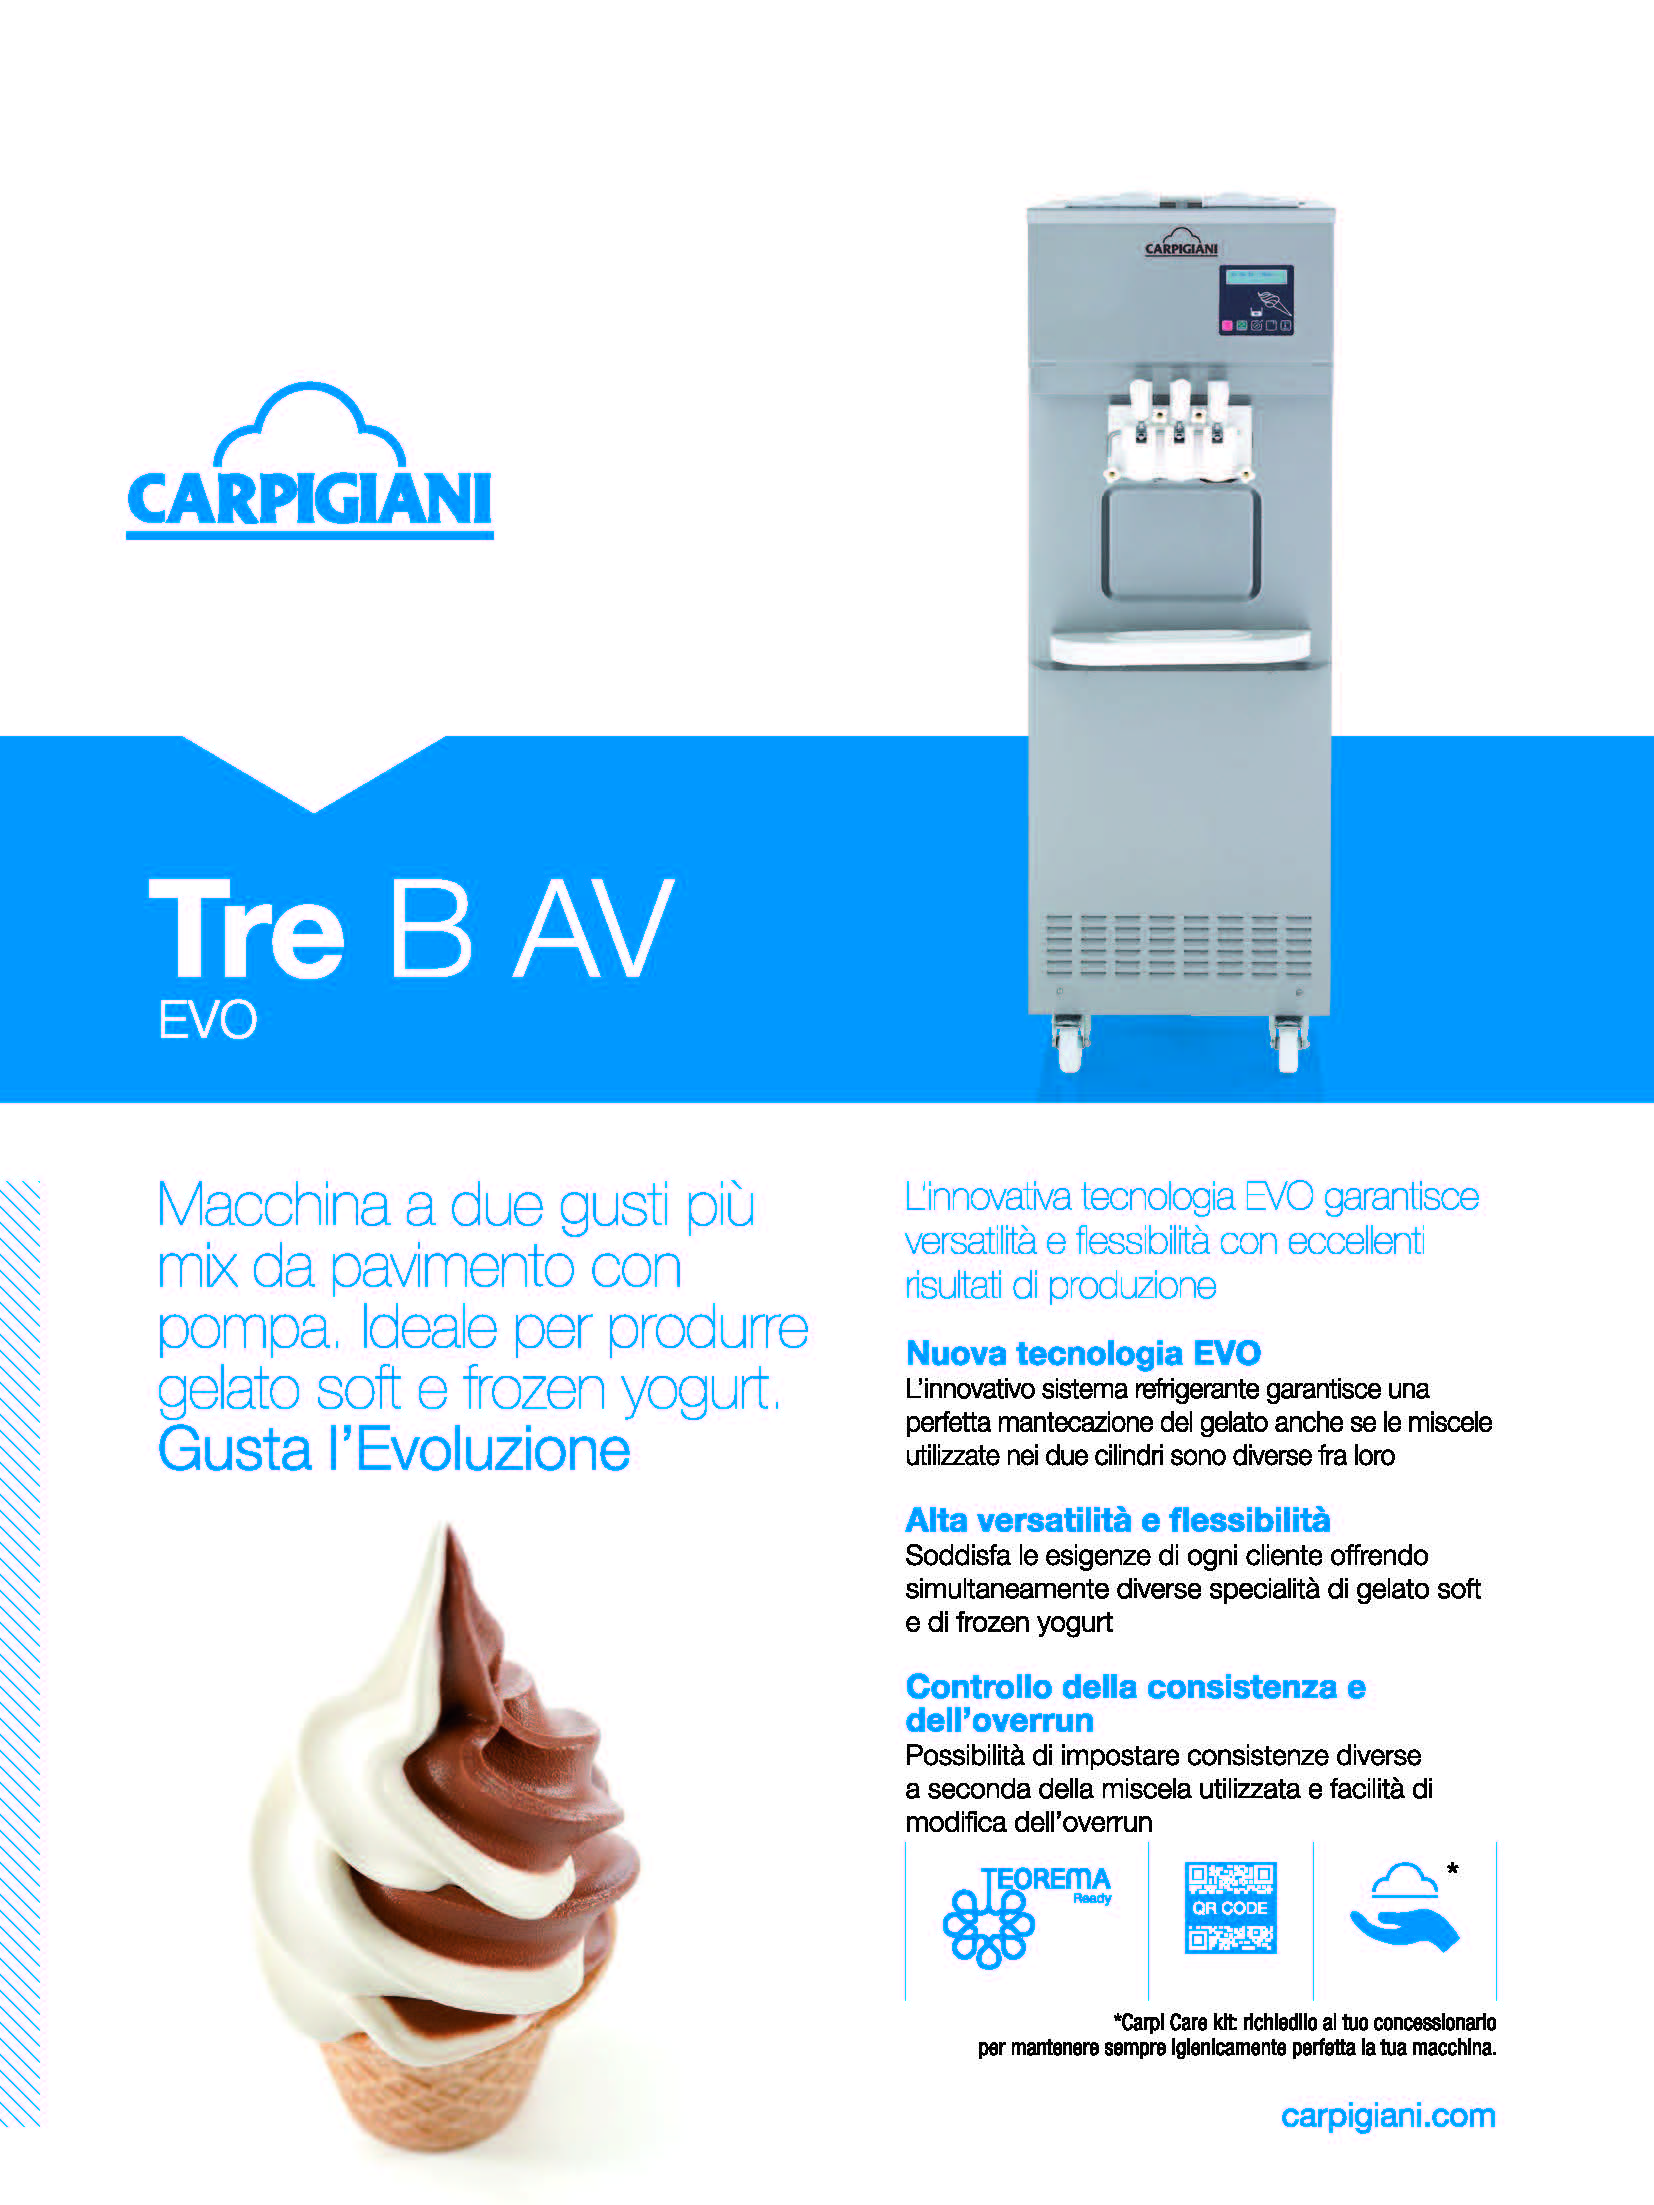 Carpigiani – Tre B AV EVO